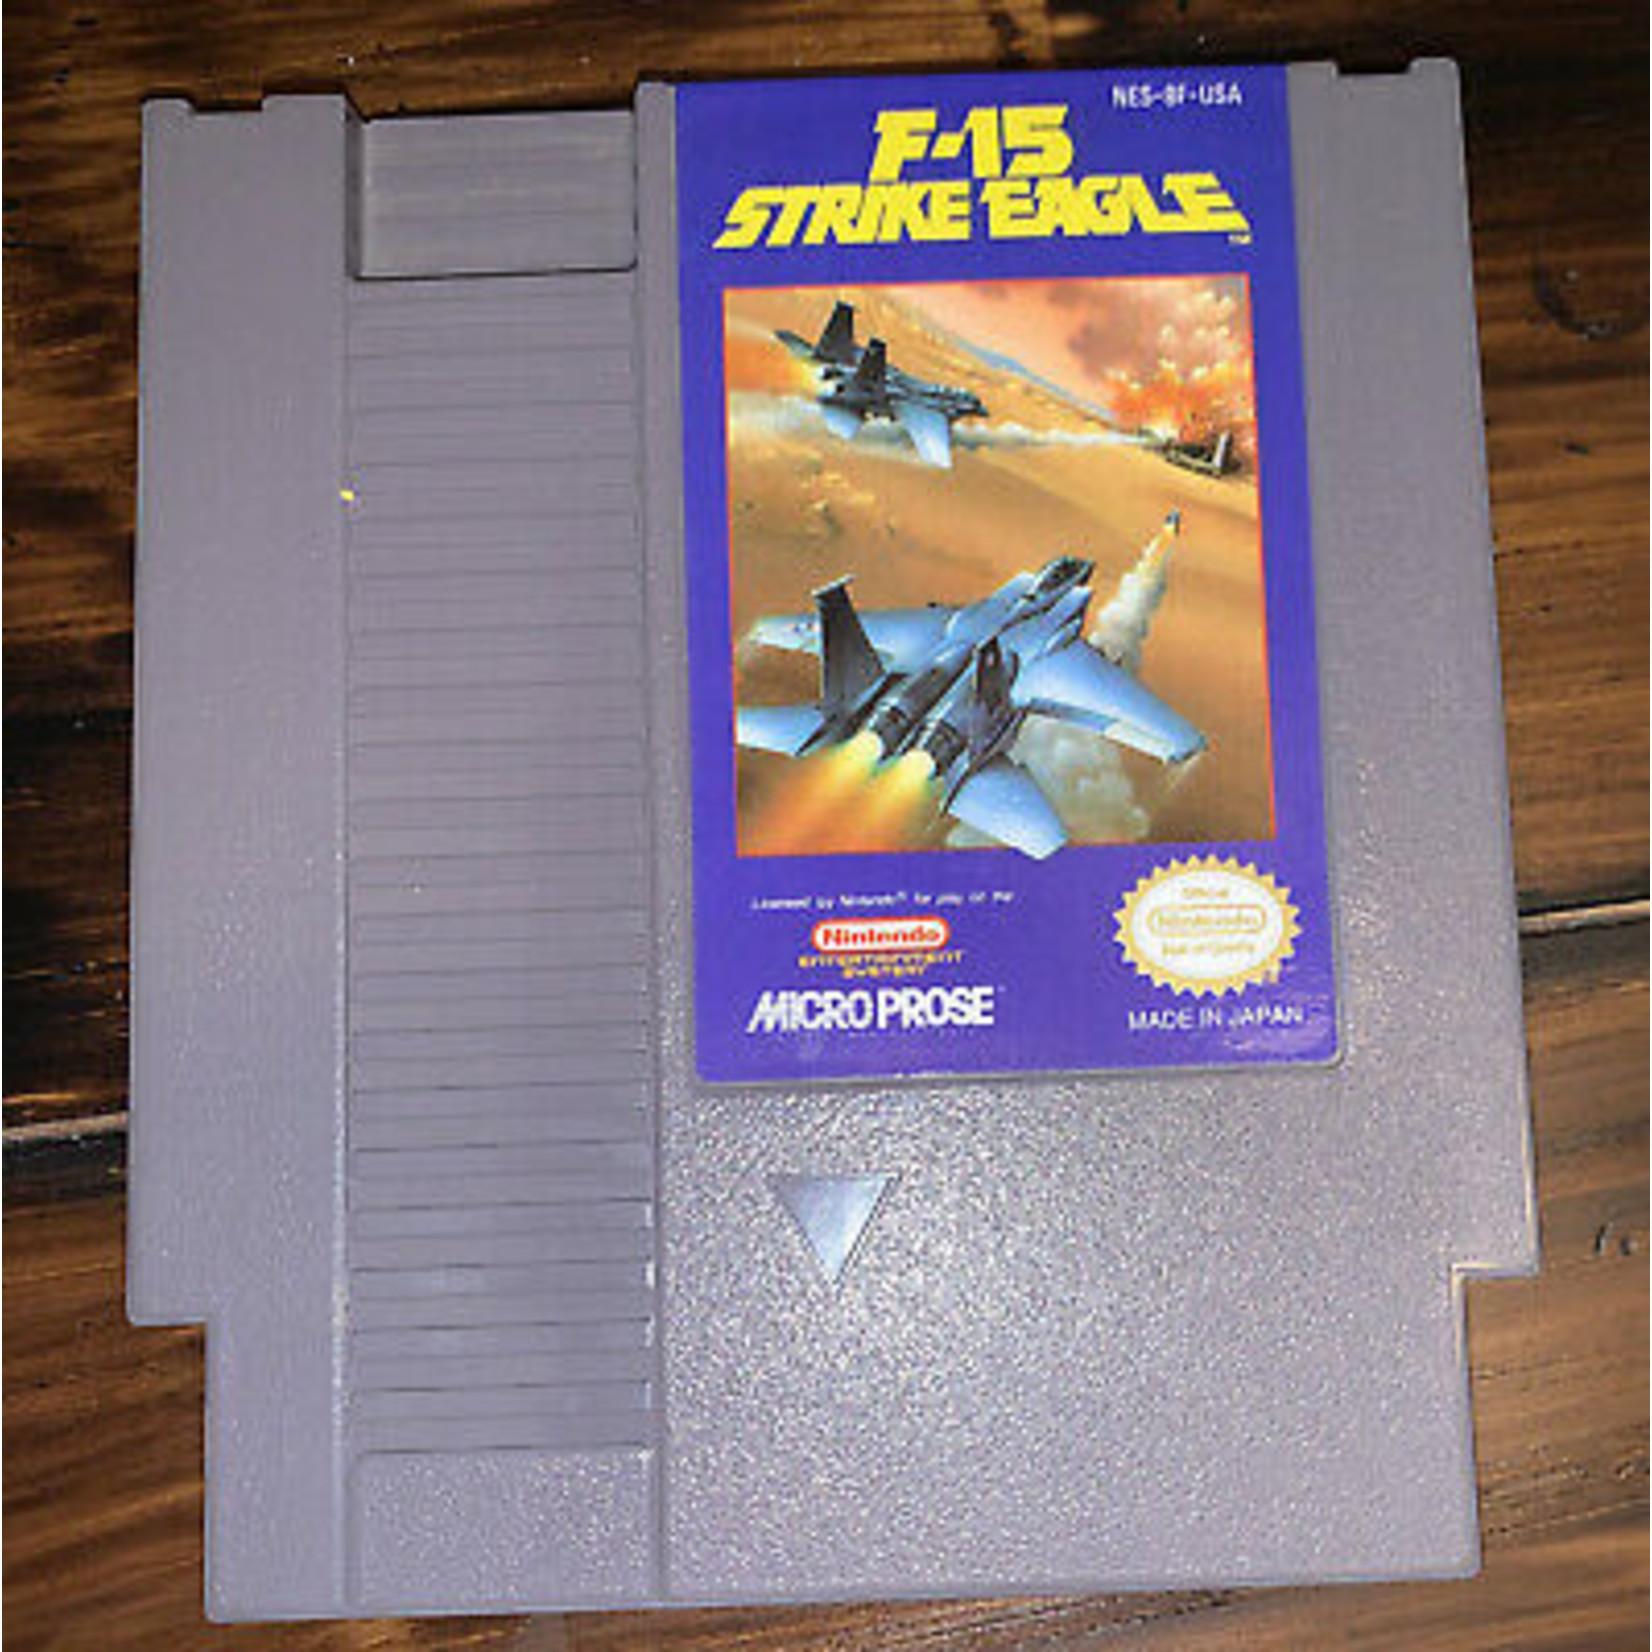 NESU-F-15 STRIKE EAGLE (CART)